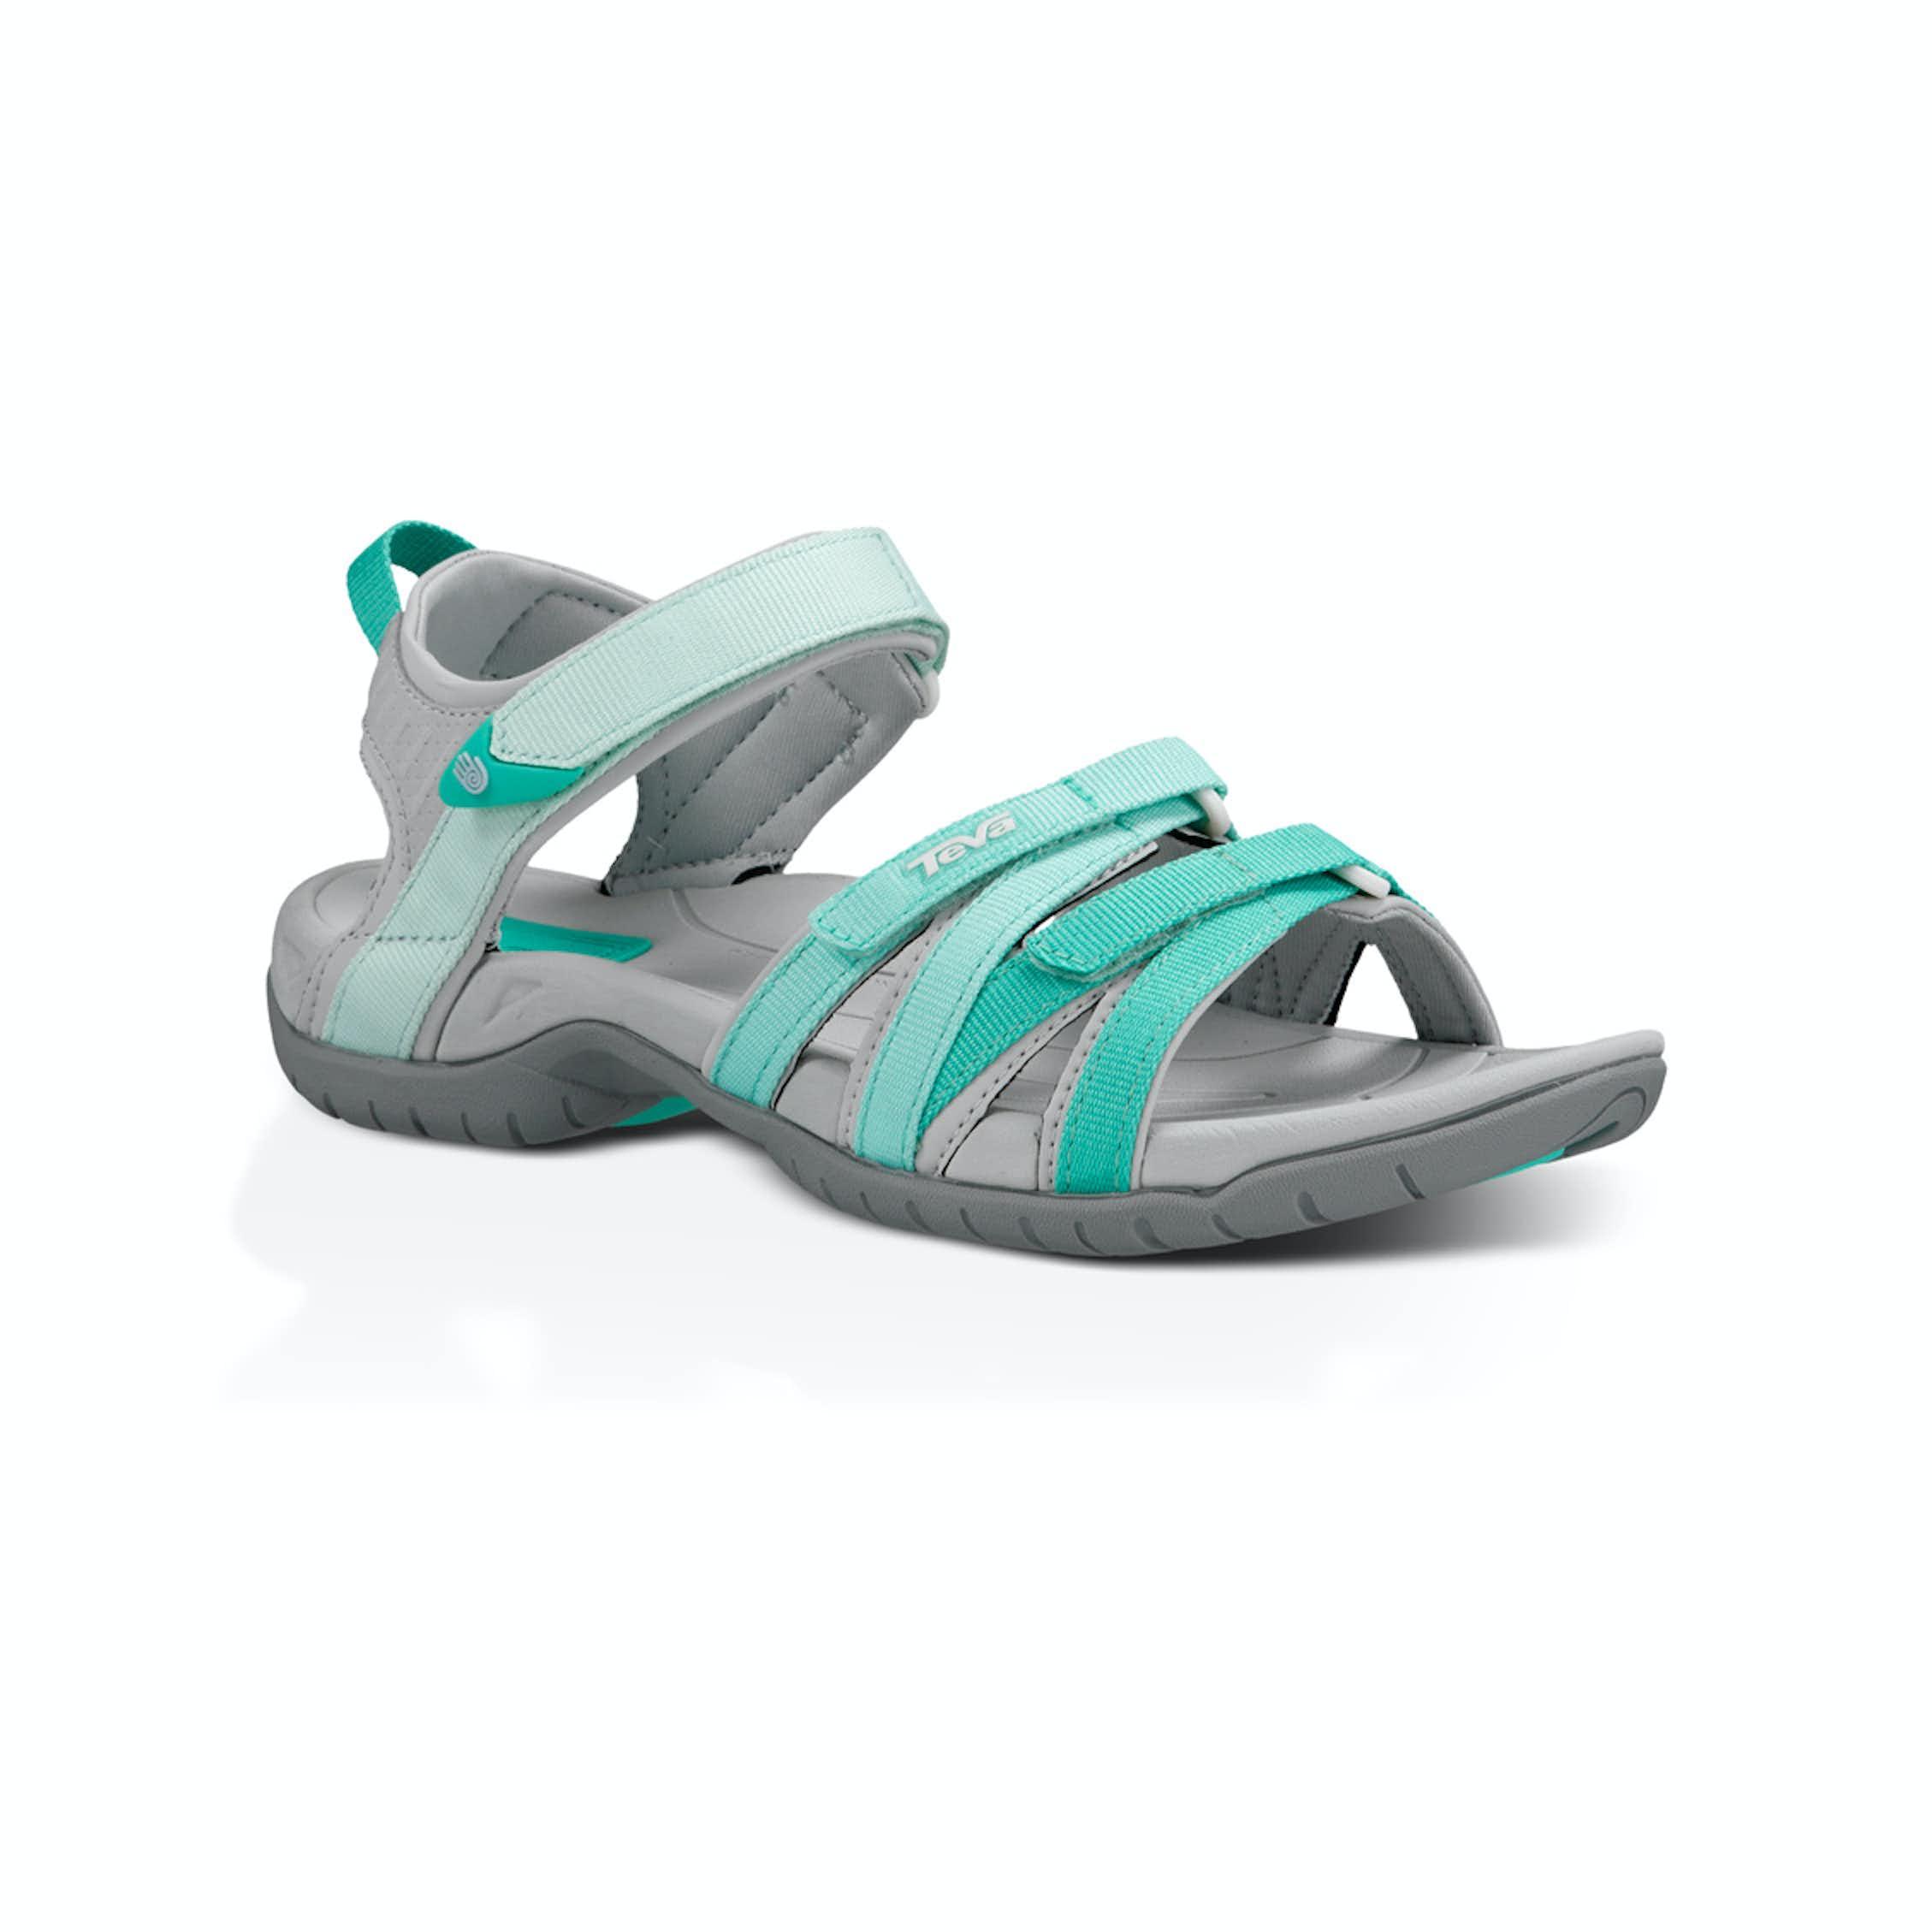 bfc1a96c59be Teva Tirra Women s Sandals ...